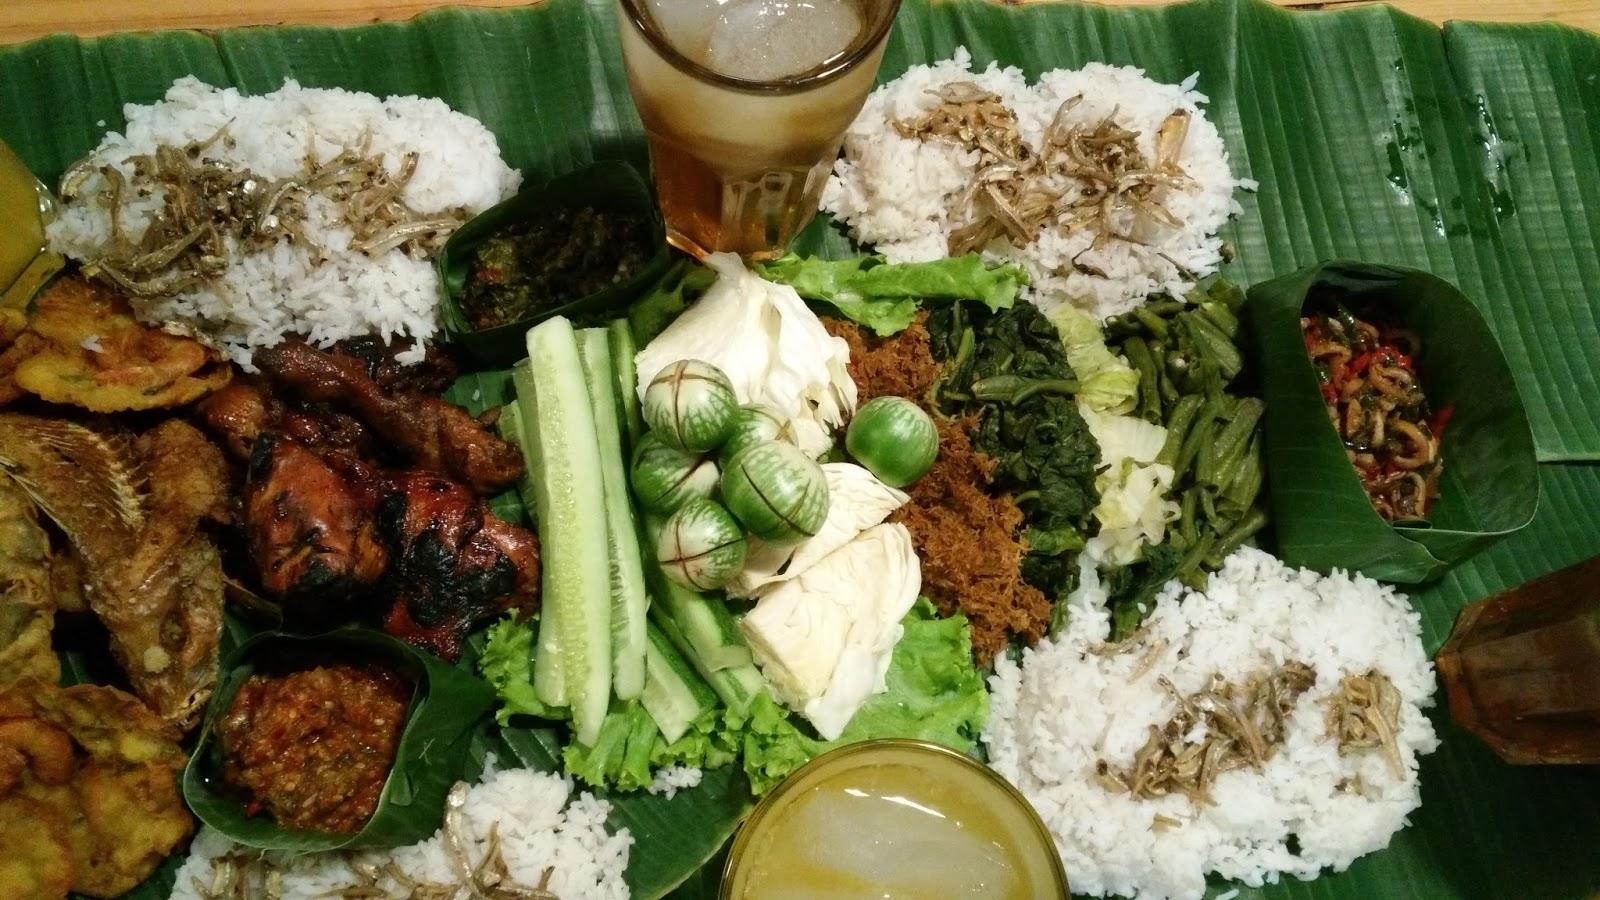 Tradisi liwetan sudah ada sejak zaman kerajaan dan menjadi tradisi selametan dalam ajaran Islam di Jawa (foto: menulisindonesia.com)